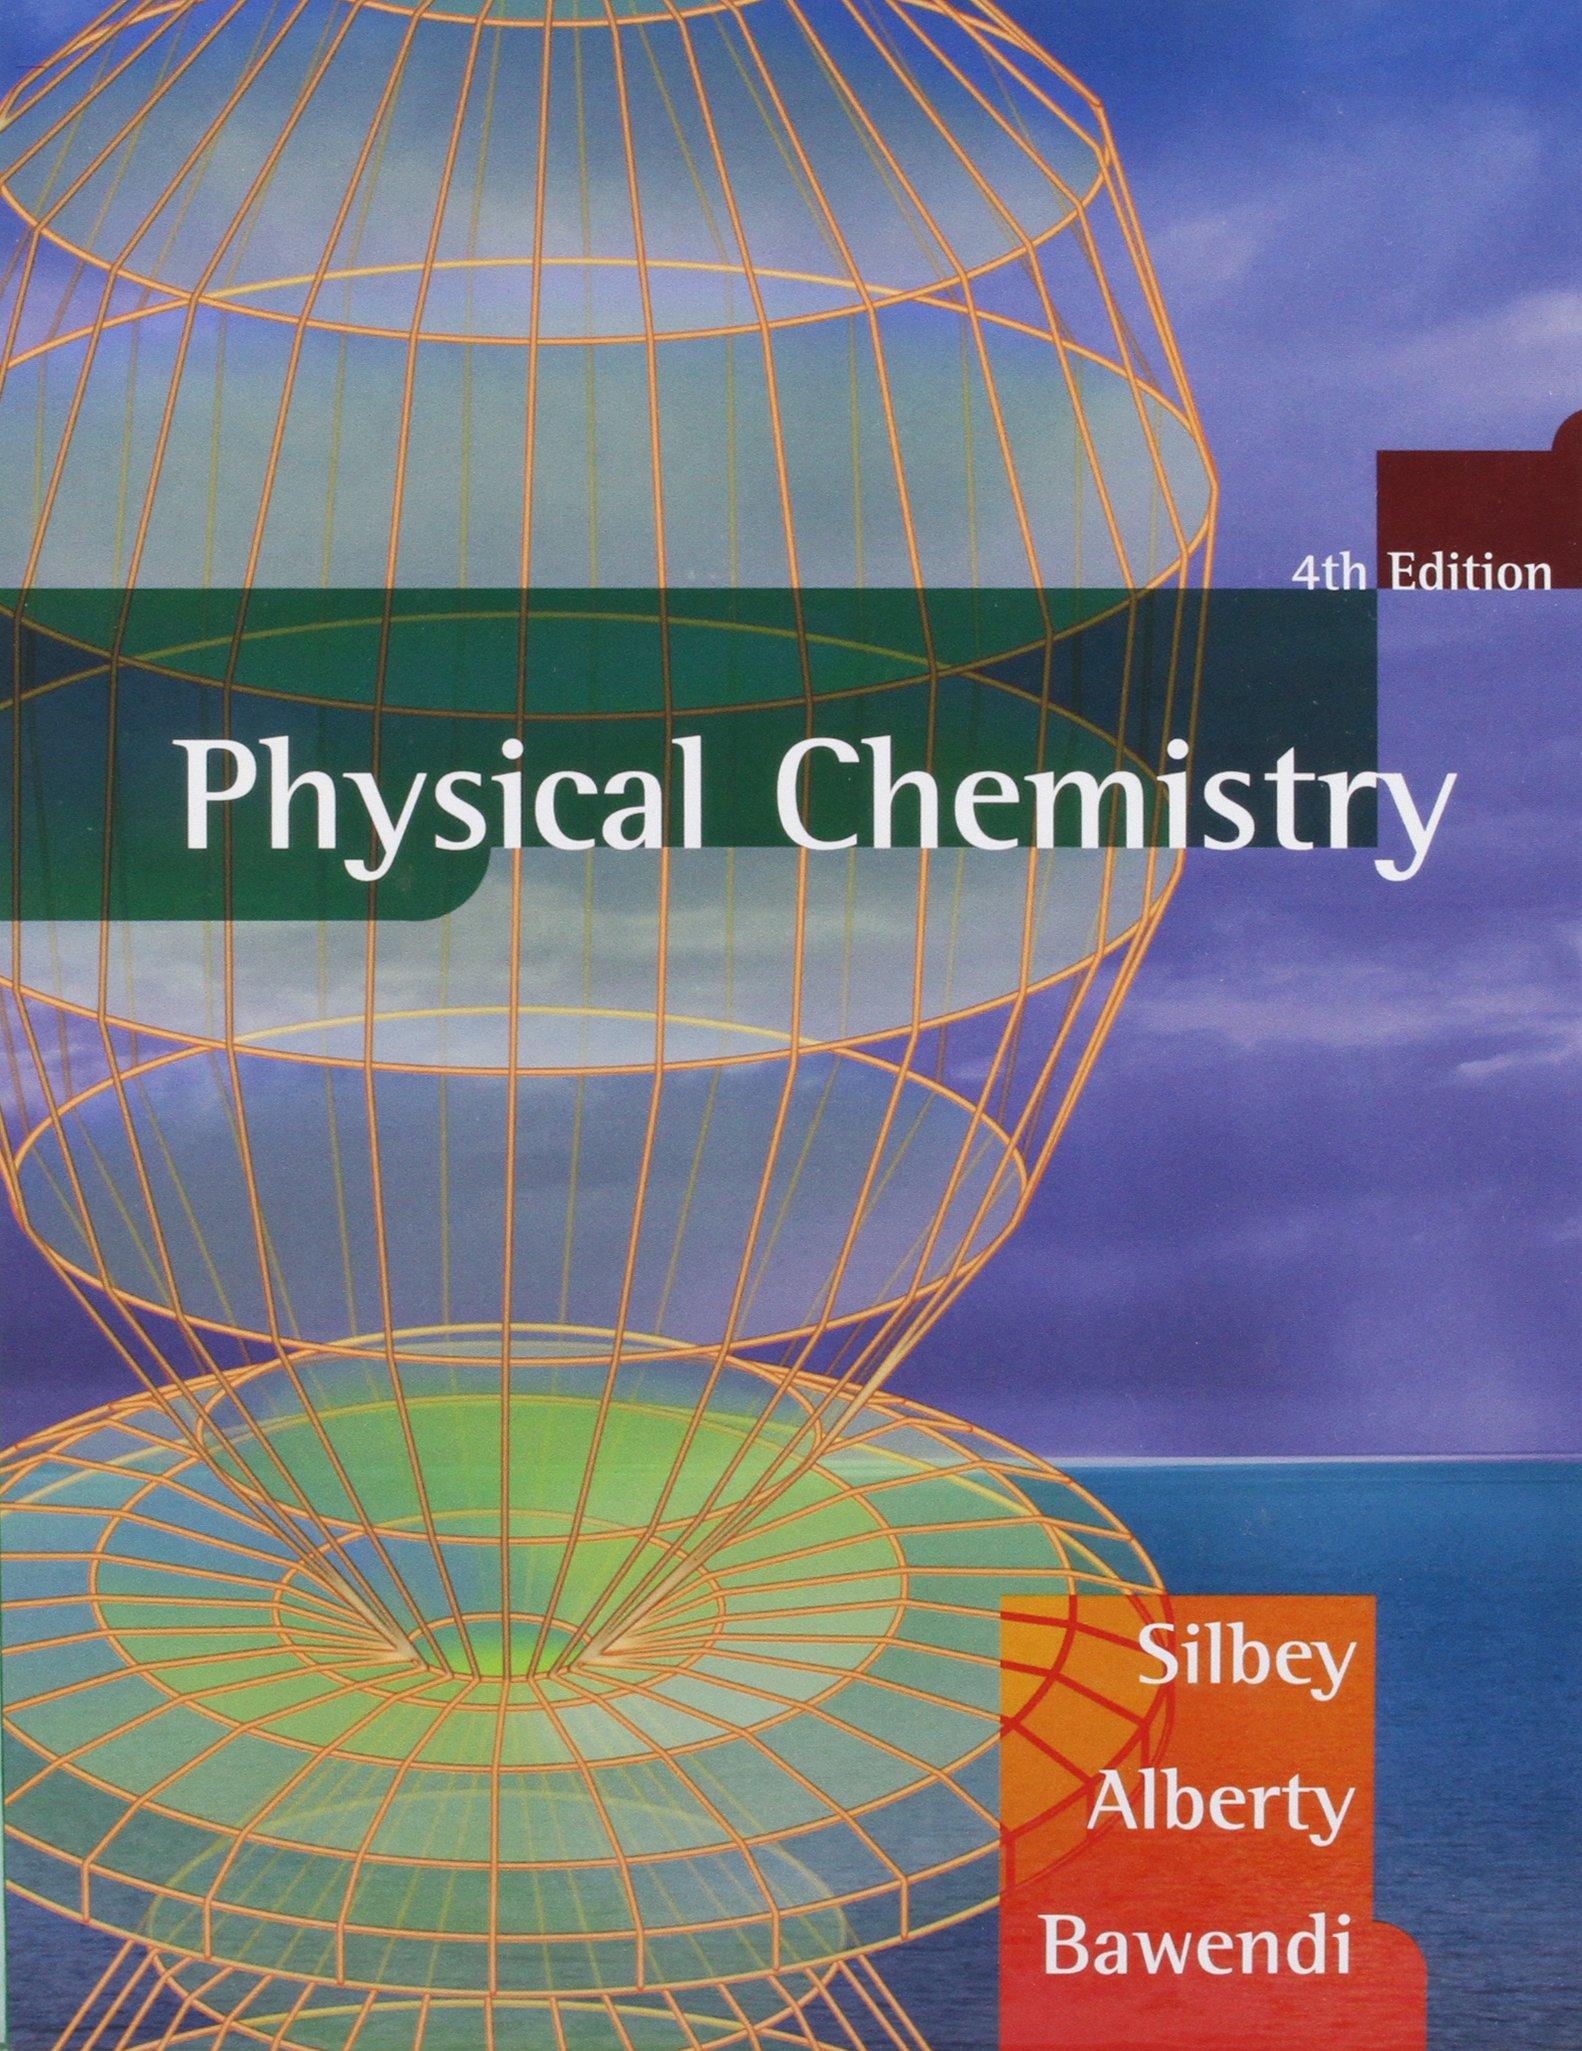 Solutions Manual to accompany Physical Chemistry, 4e: Robert J. Silbey,  Robert A. Alberty, Moungi G. Bawendi: 9780471696292: Amazon.com: Books